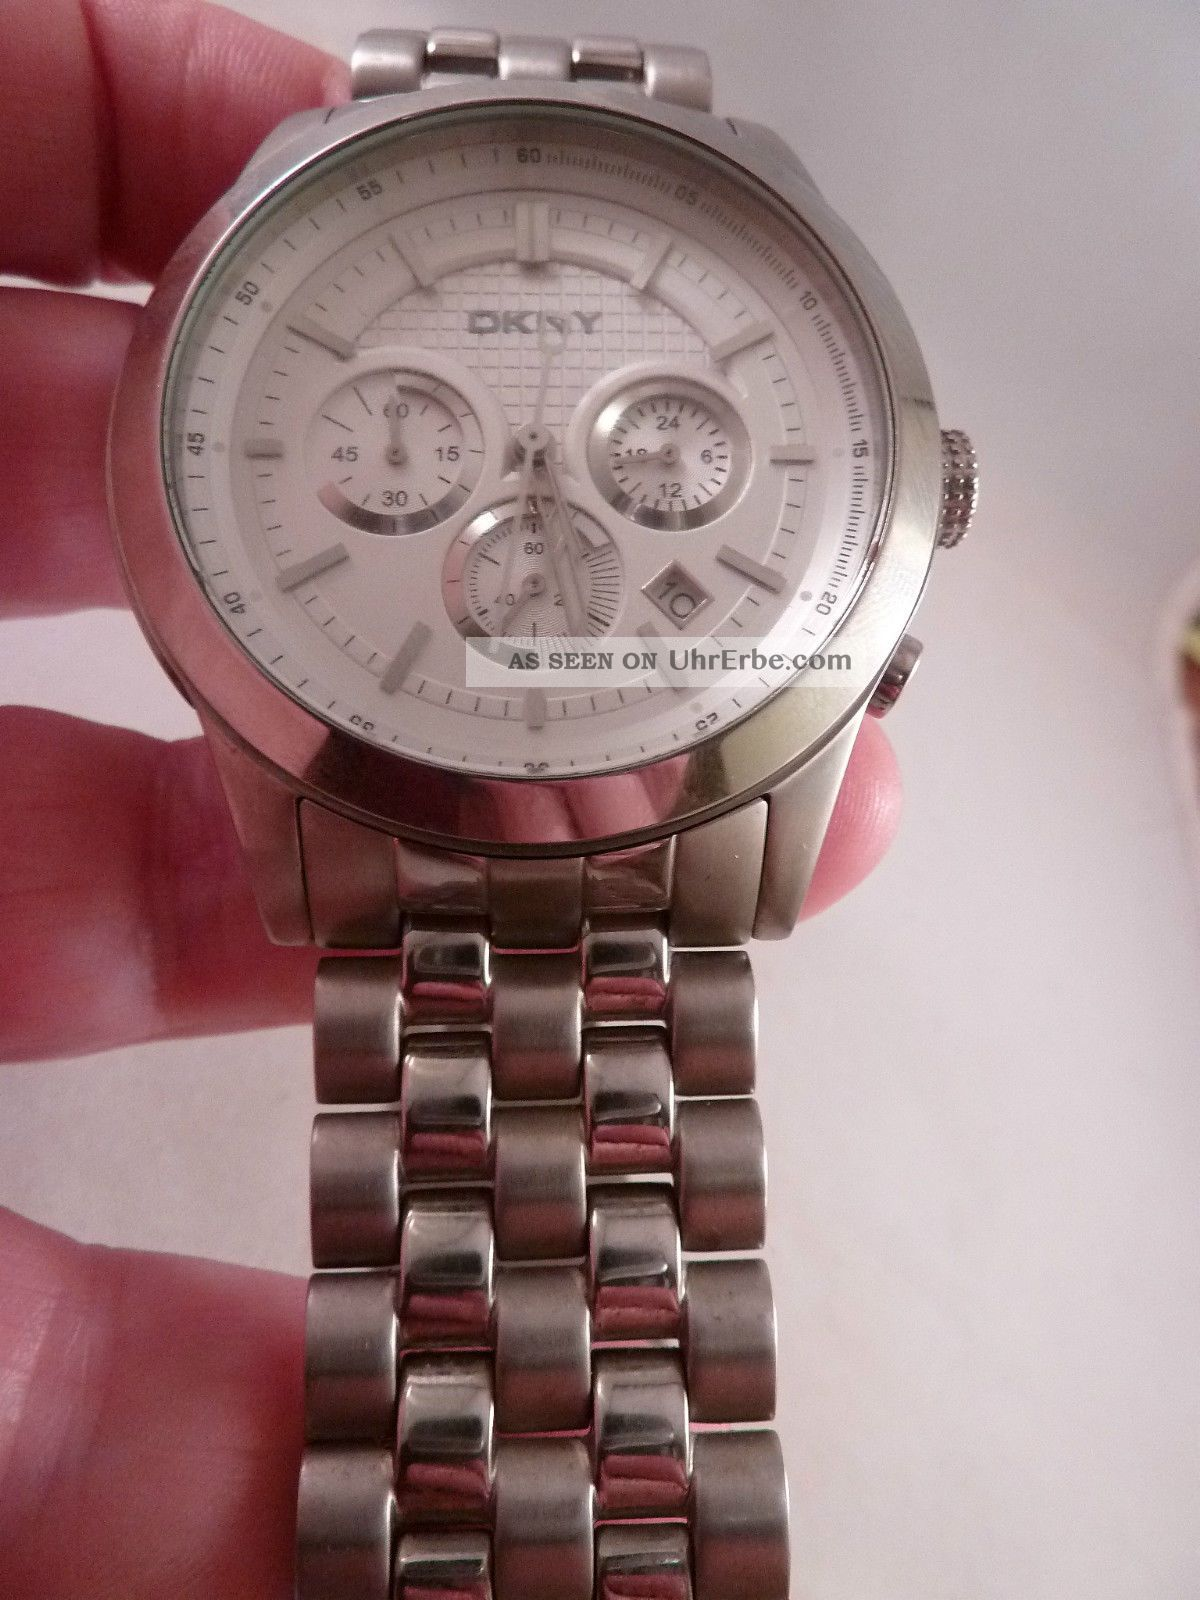 Dkny Ny 1421 Herren - Chronograph,  Edelstahl,  Datum,  Sekundenzeiger,  Stopp Funktion Armbanduhren Bild